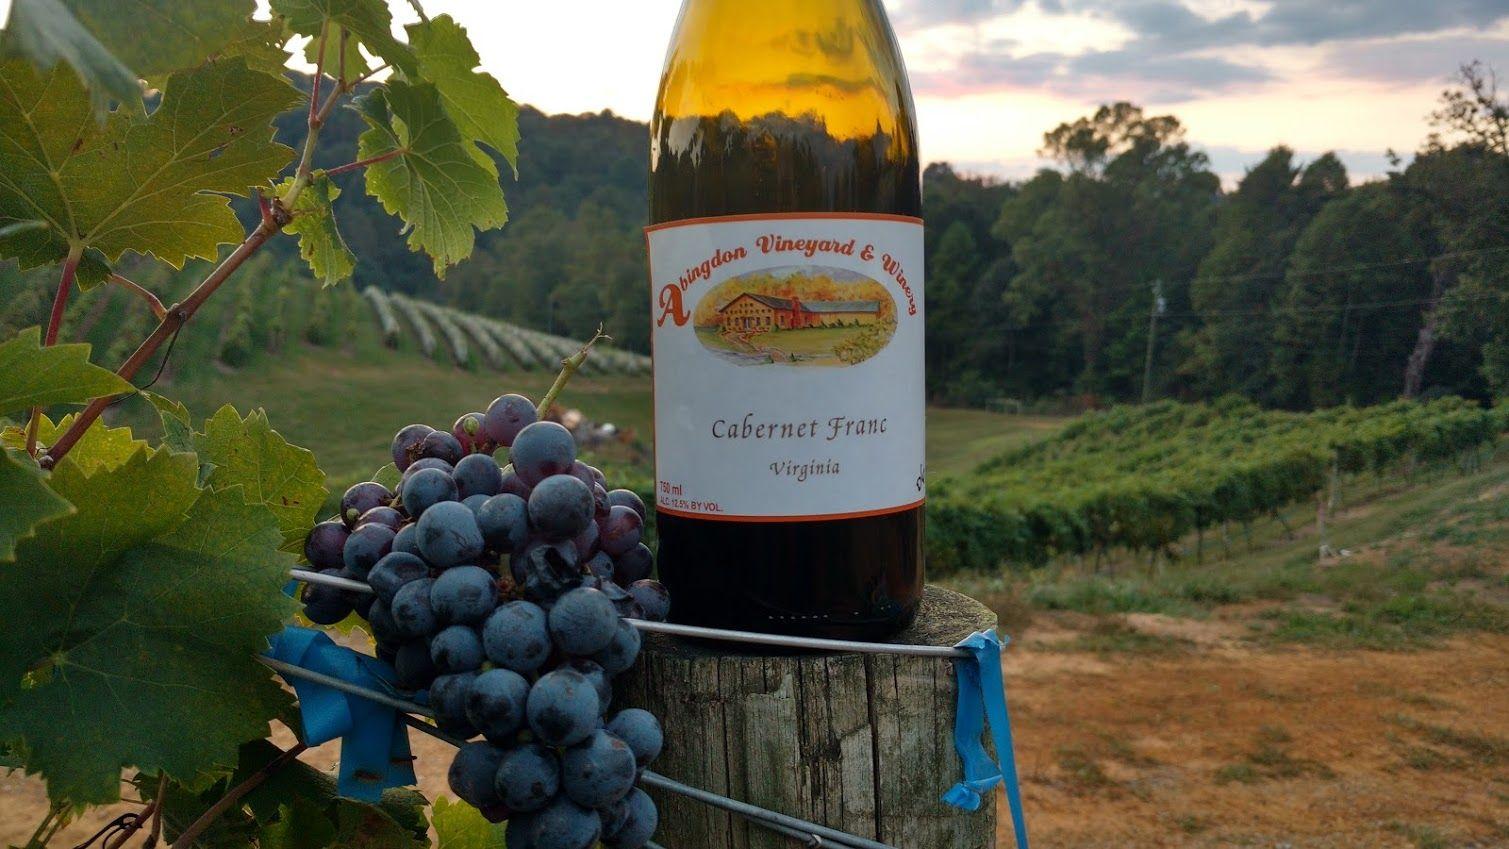 abingdon vineyard and winery